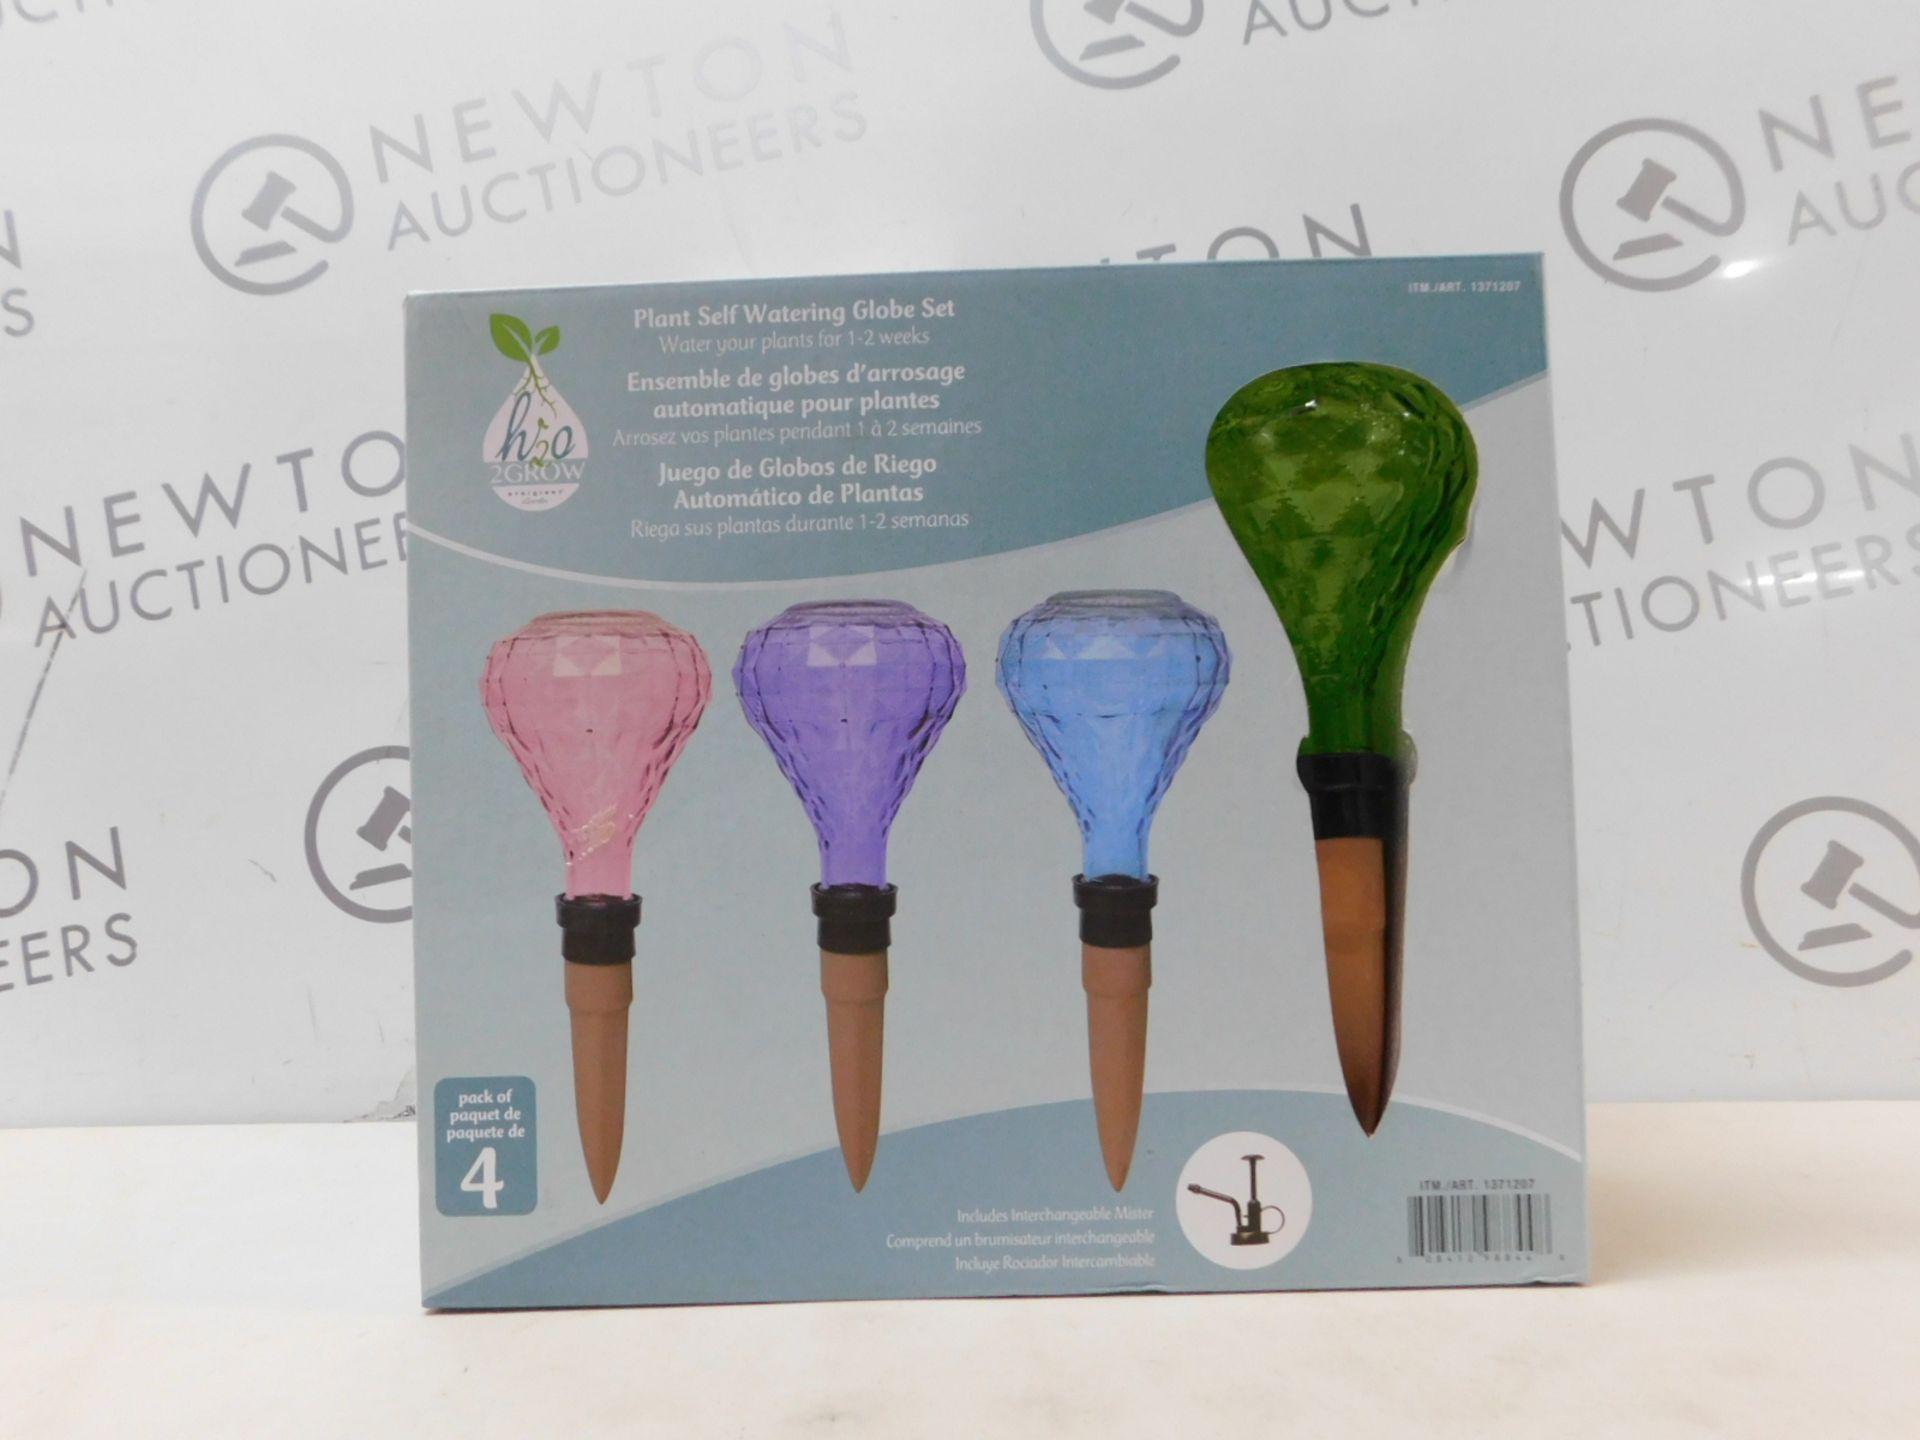 1 BOXED 2GROW EVERGREEN GARDEN PLANT SELF WATERING GLOBE SET RRP £29